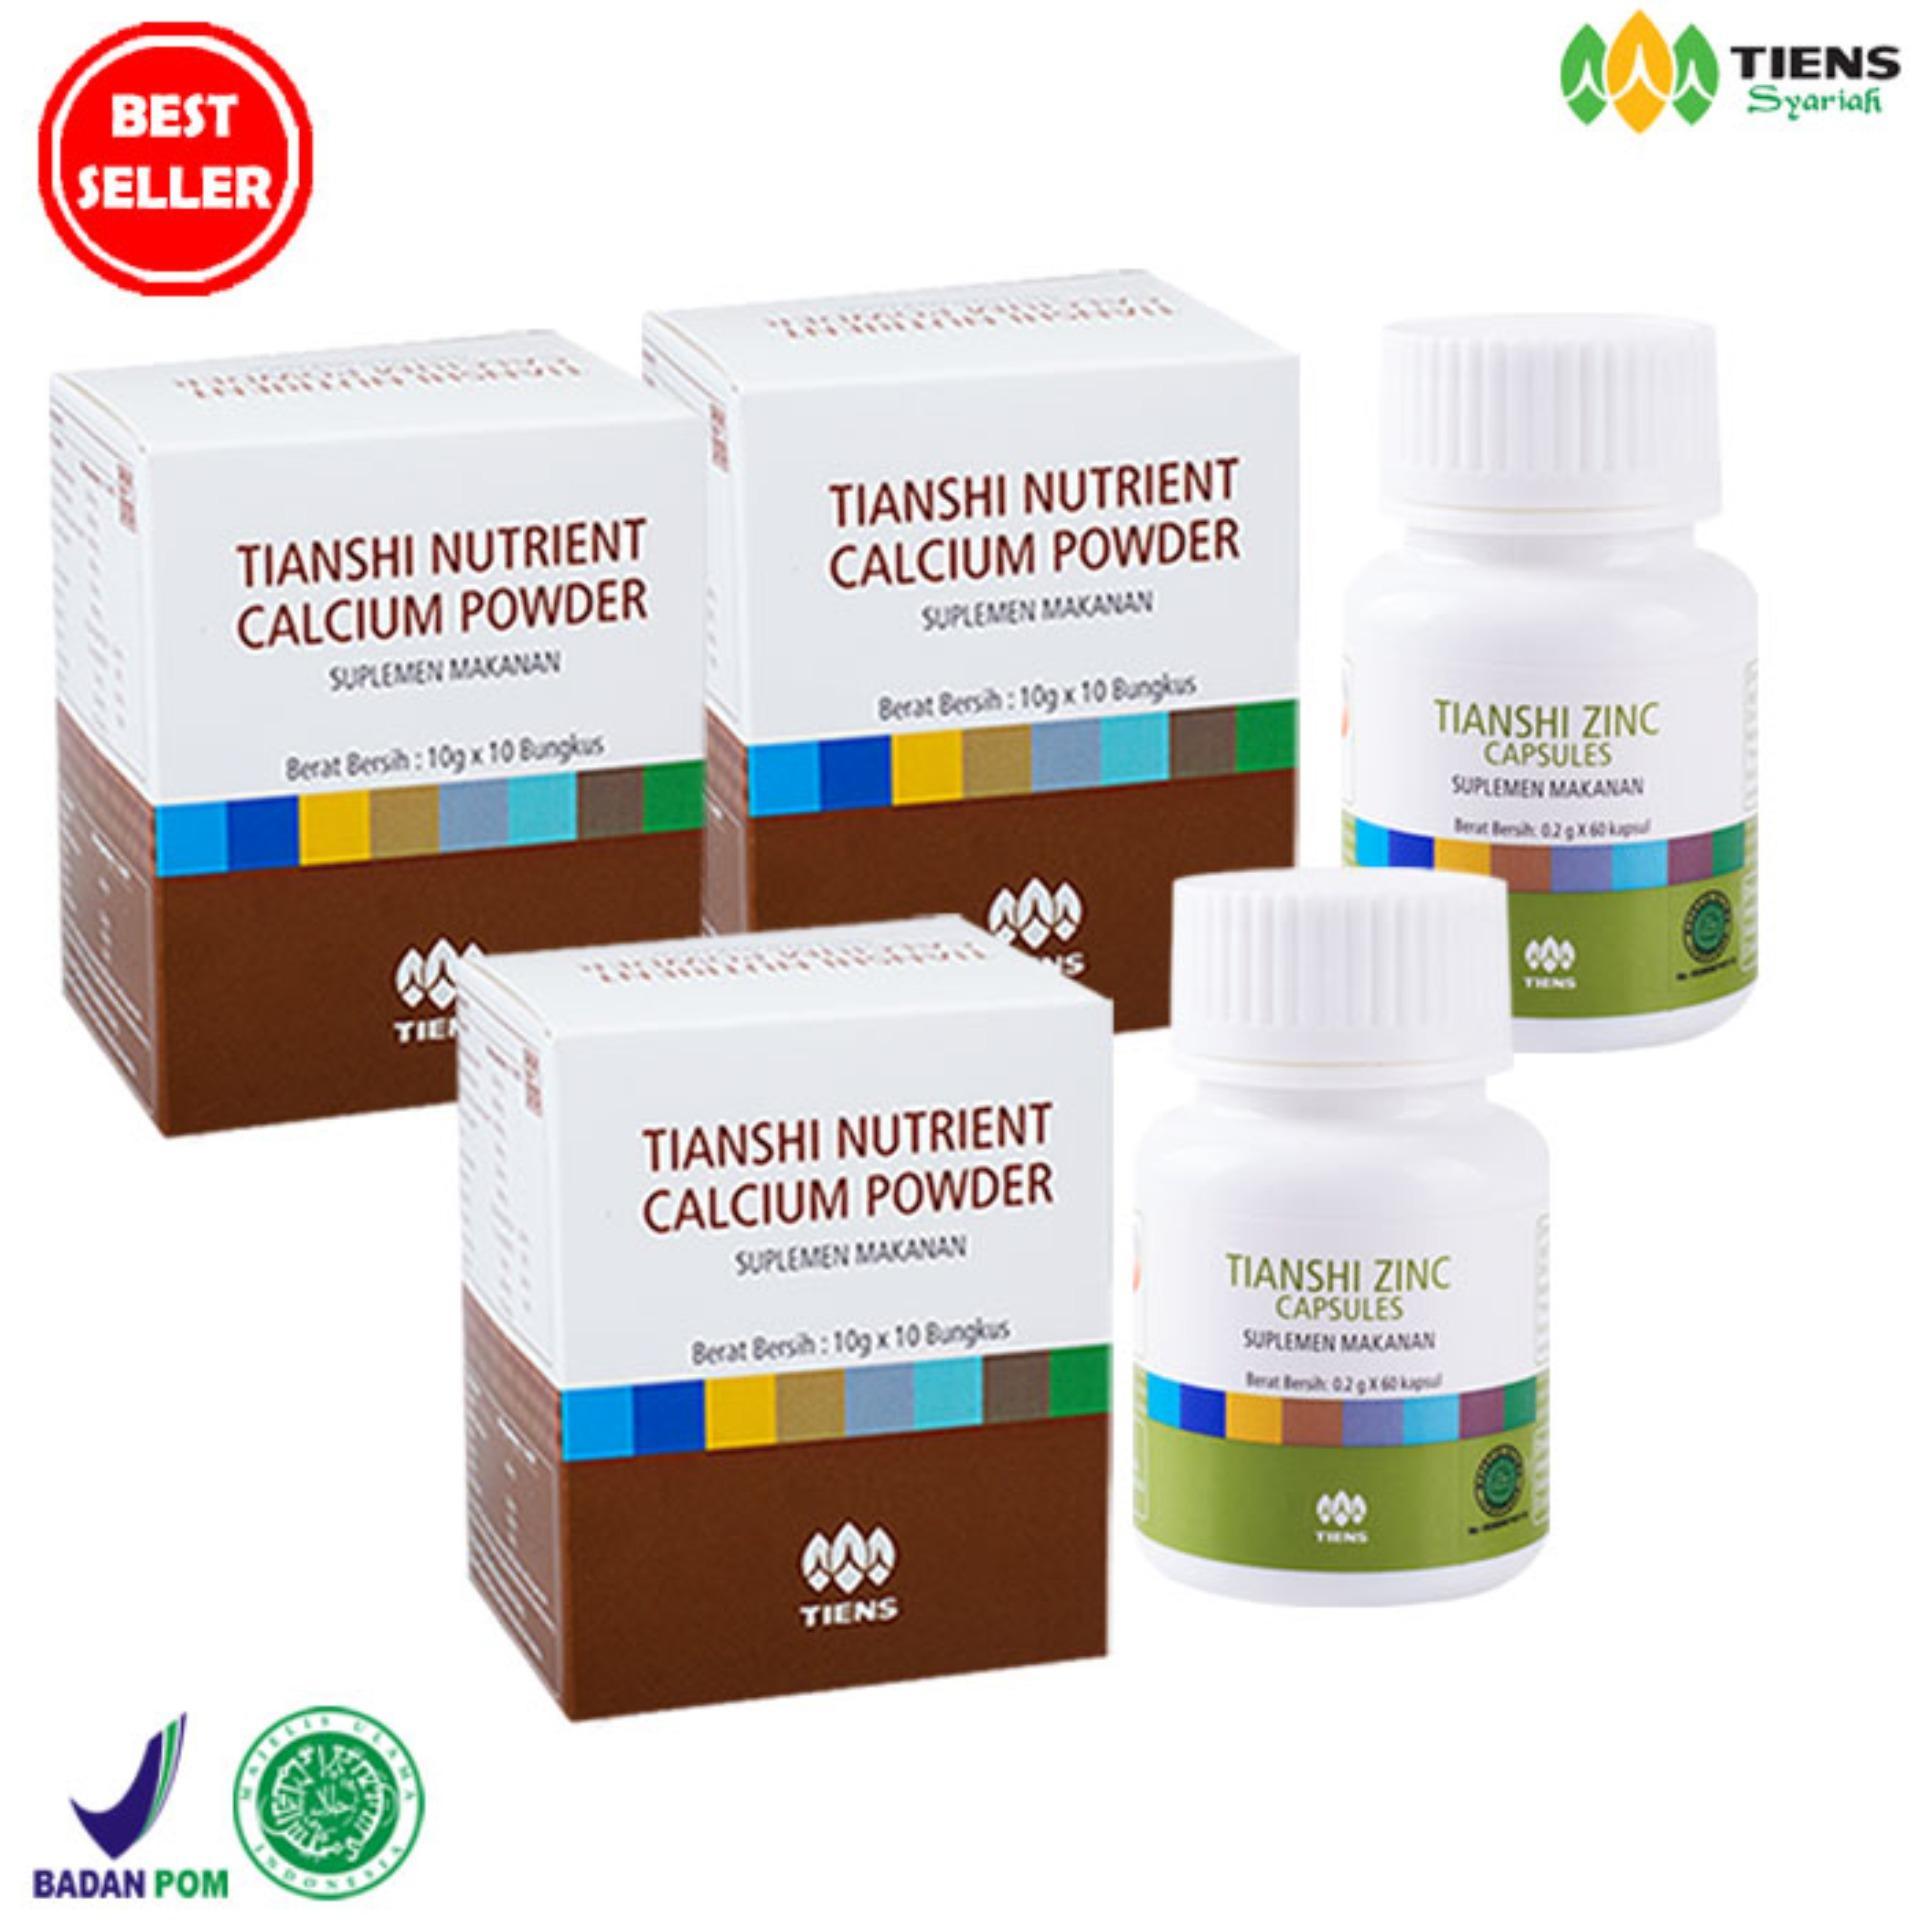 Tiens Paket Peninggi Badan Basic Free Kuas Masker Zinc Nutrient Tianshi Silver Calcium Powder Nhcp Kalsium Dewasa Herbal Ab1 Premium Original Source